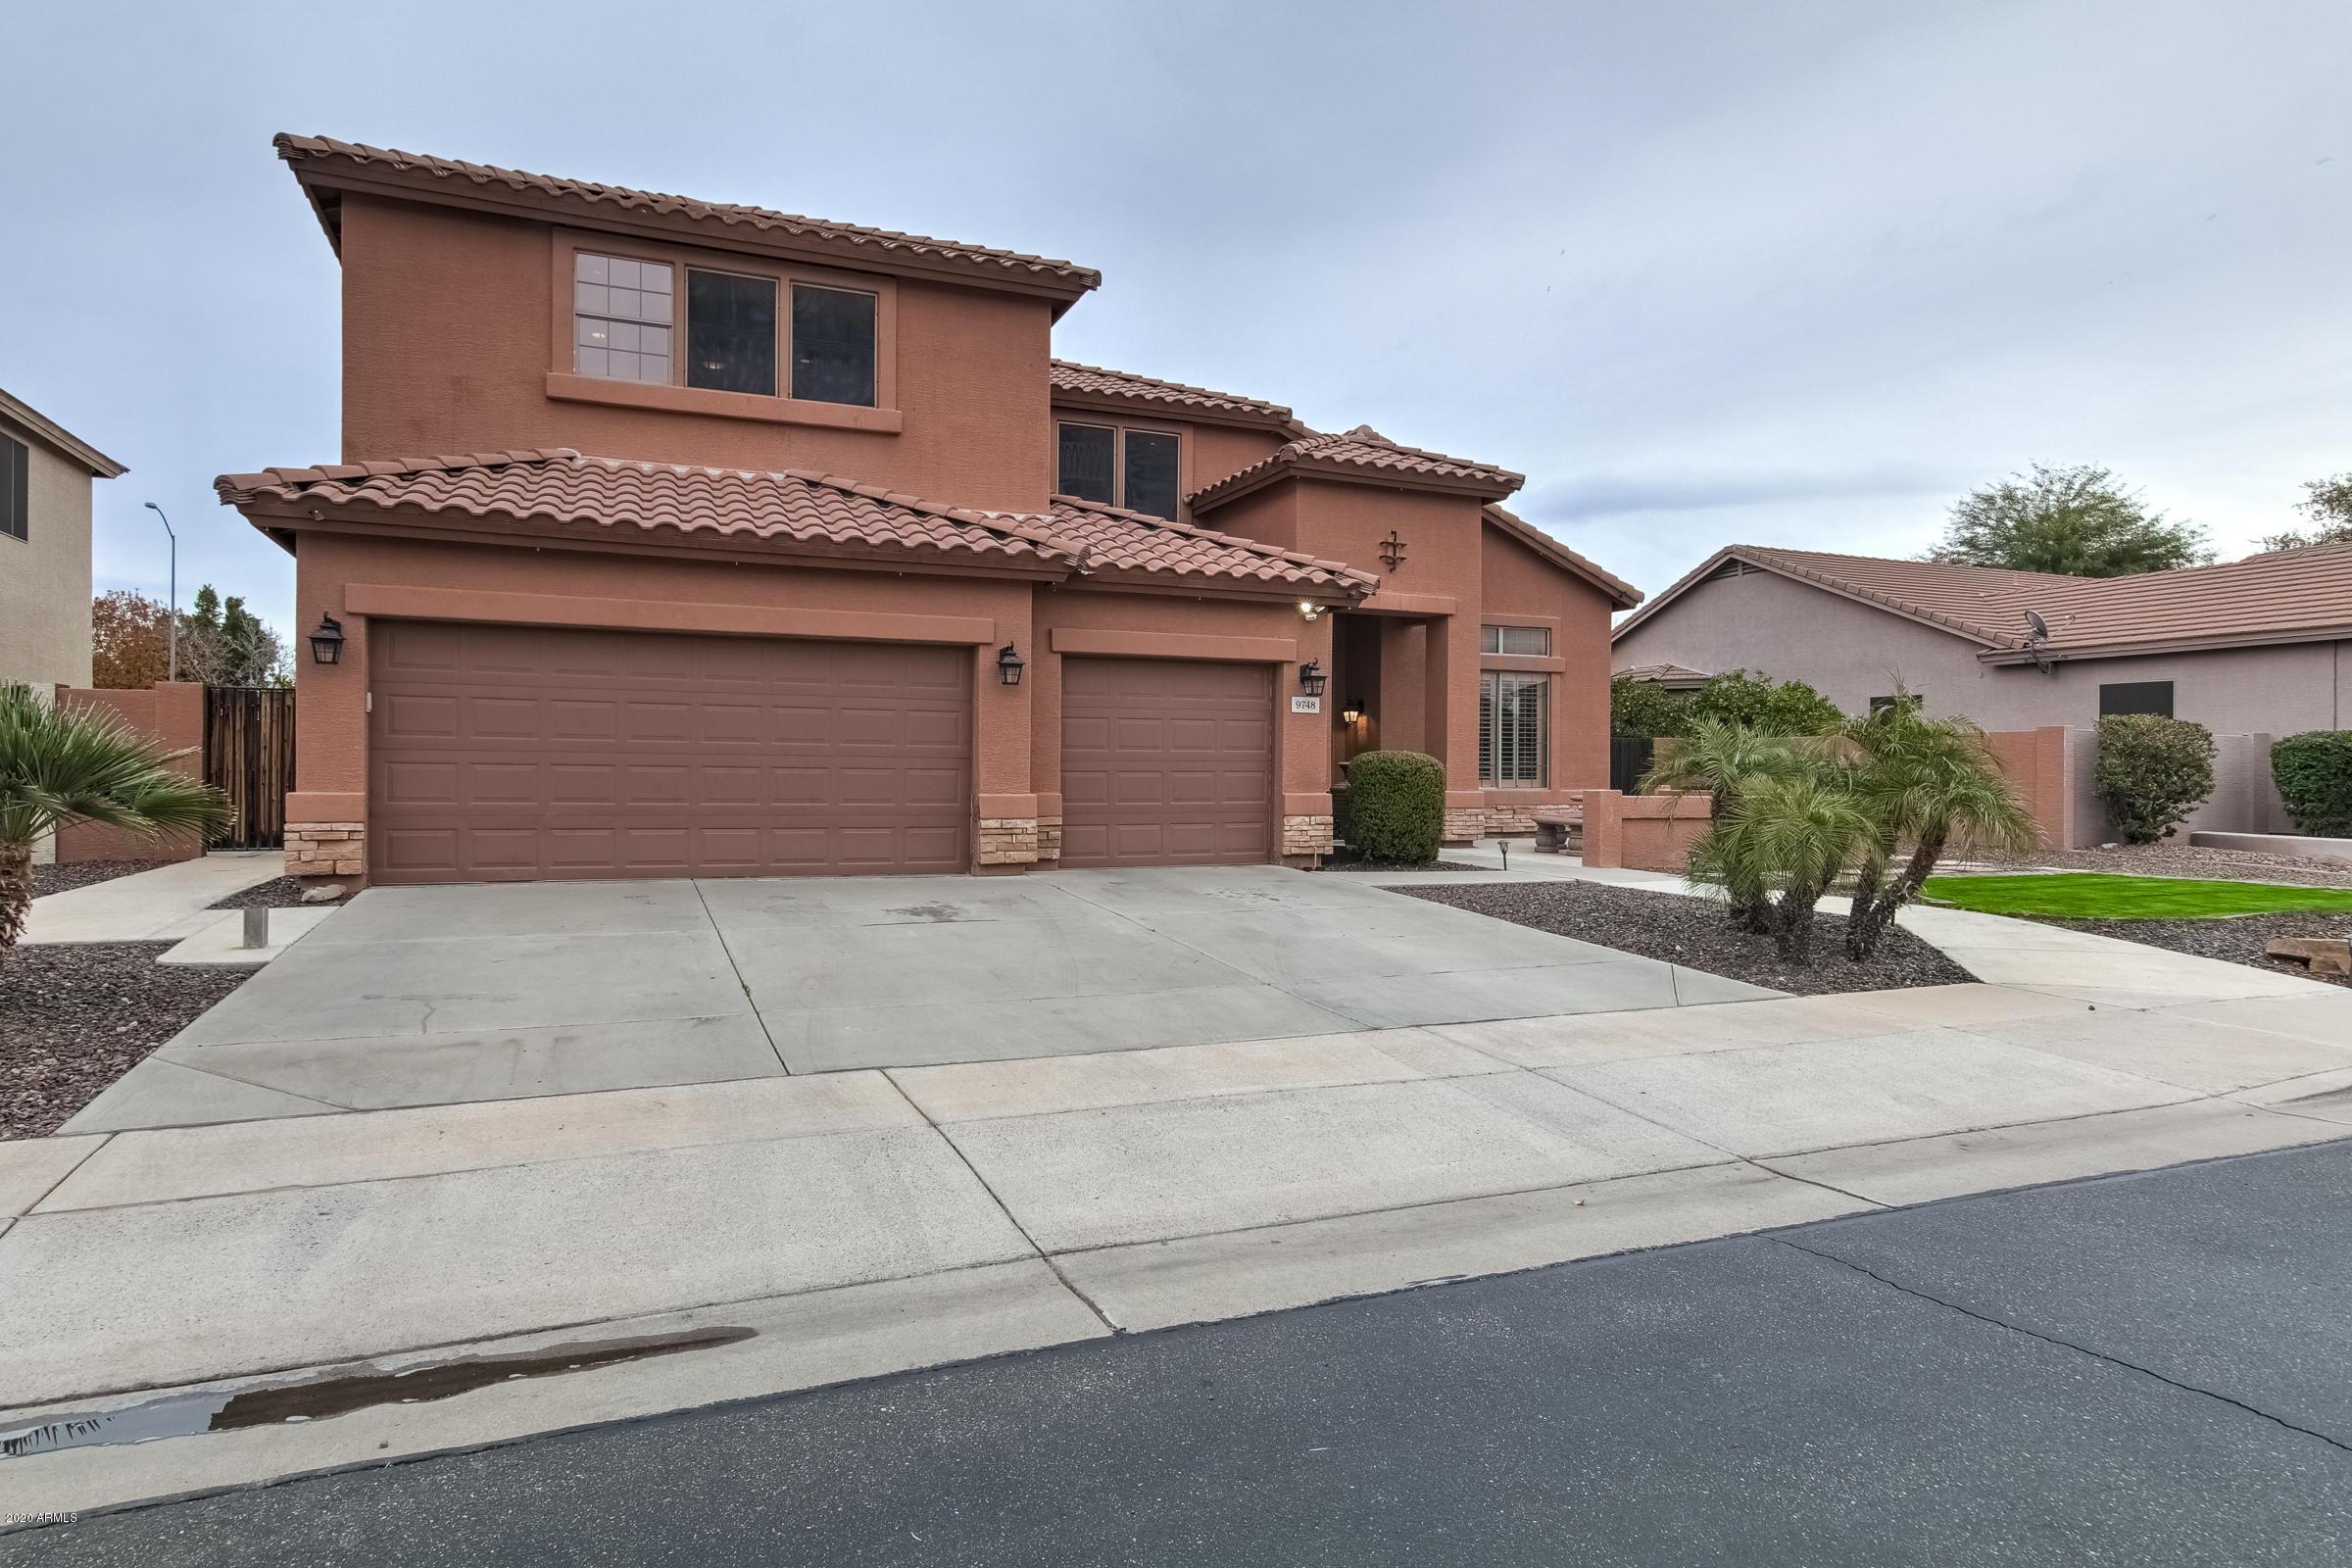 Photo of 9748 E LOMPOC Avenue, Mesa, AZ 85209